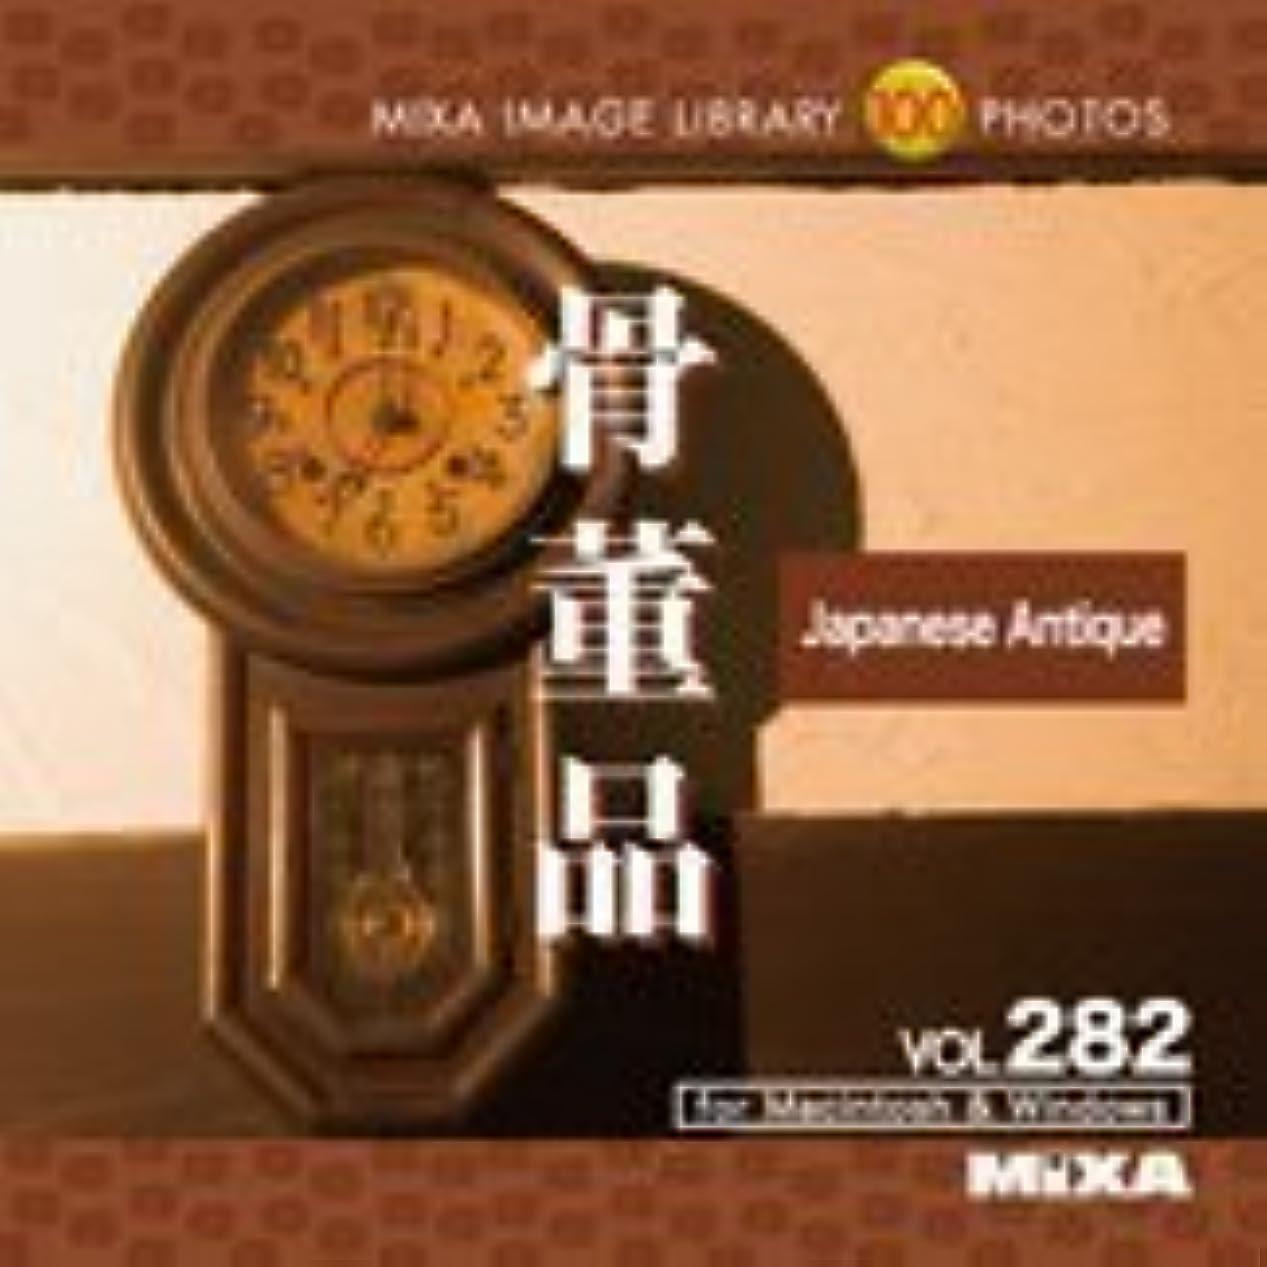 MIXA IMAGE LIBRARY Vol.282 骨董品